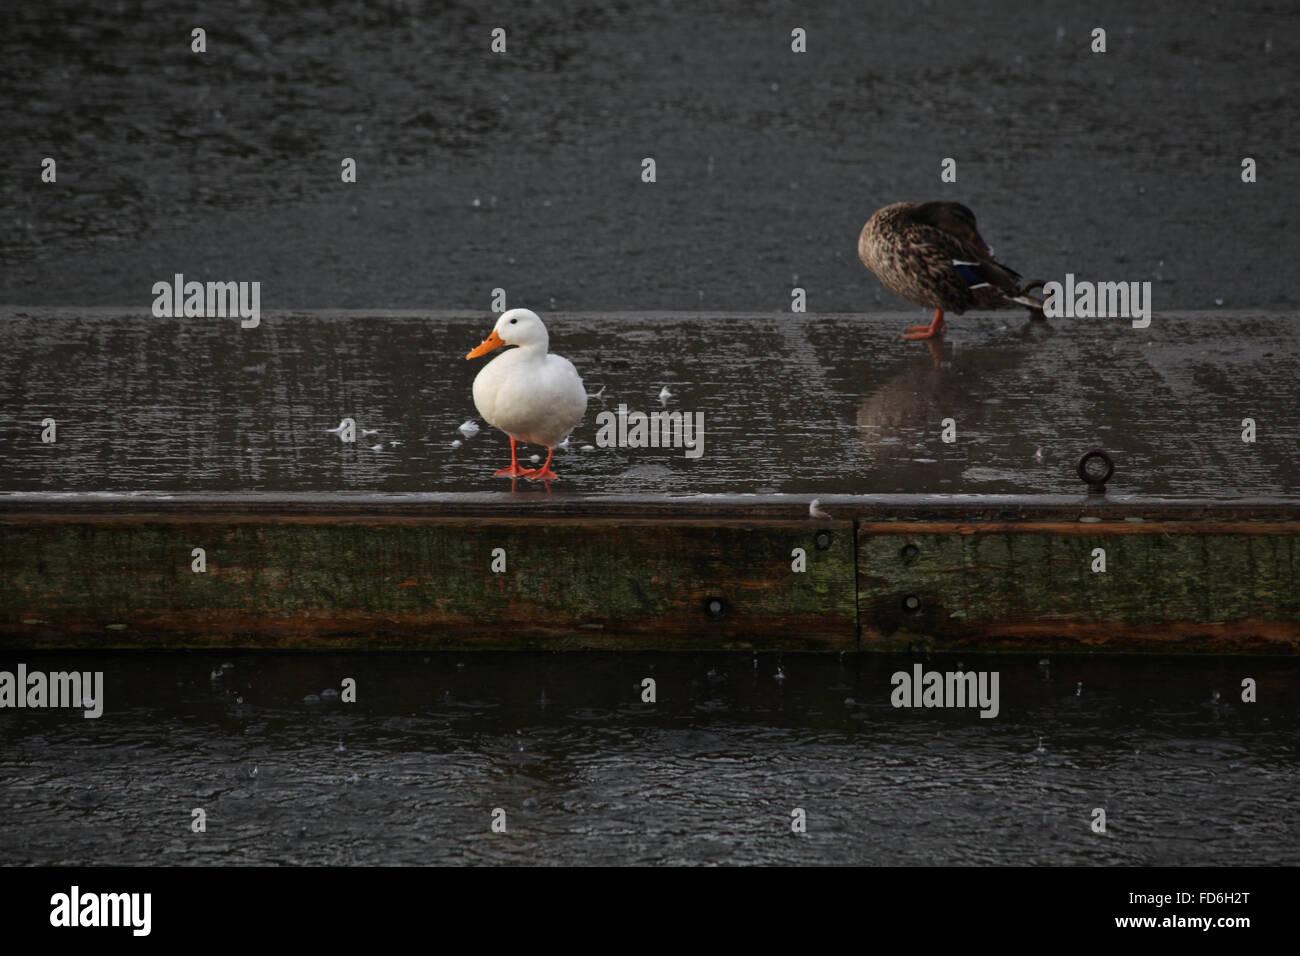 Ducks On Jetty - Stock Image